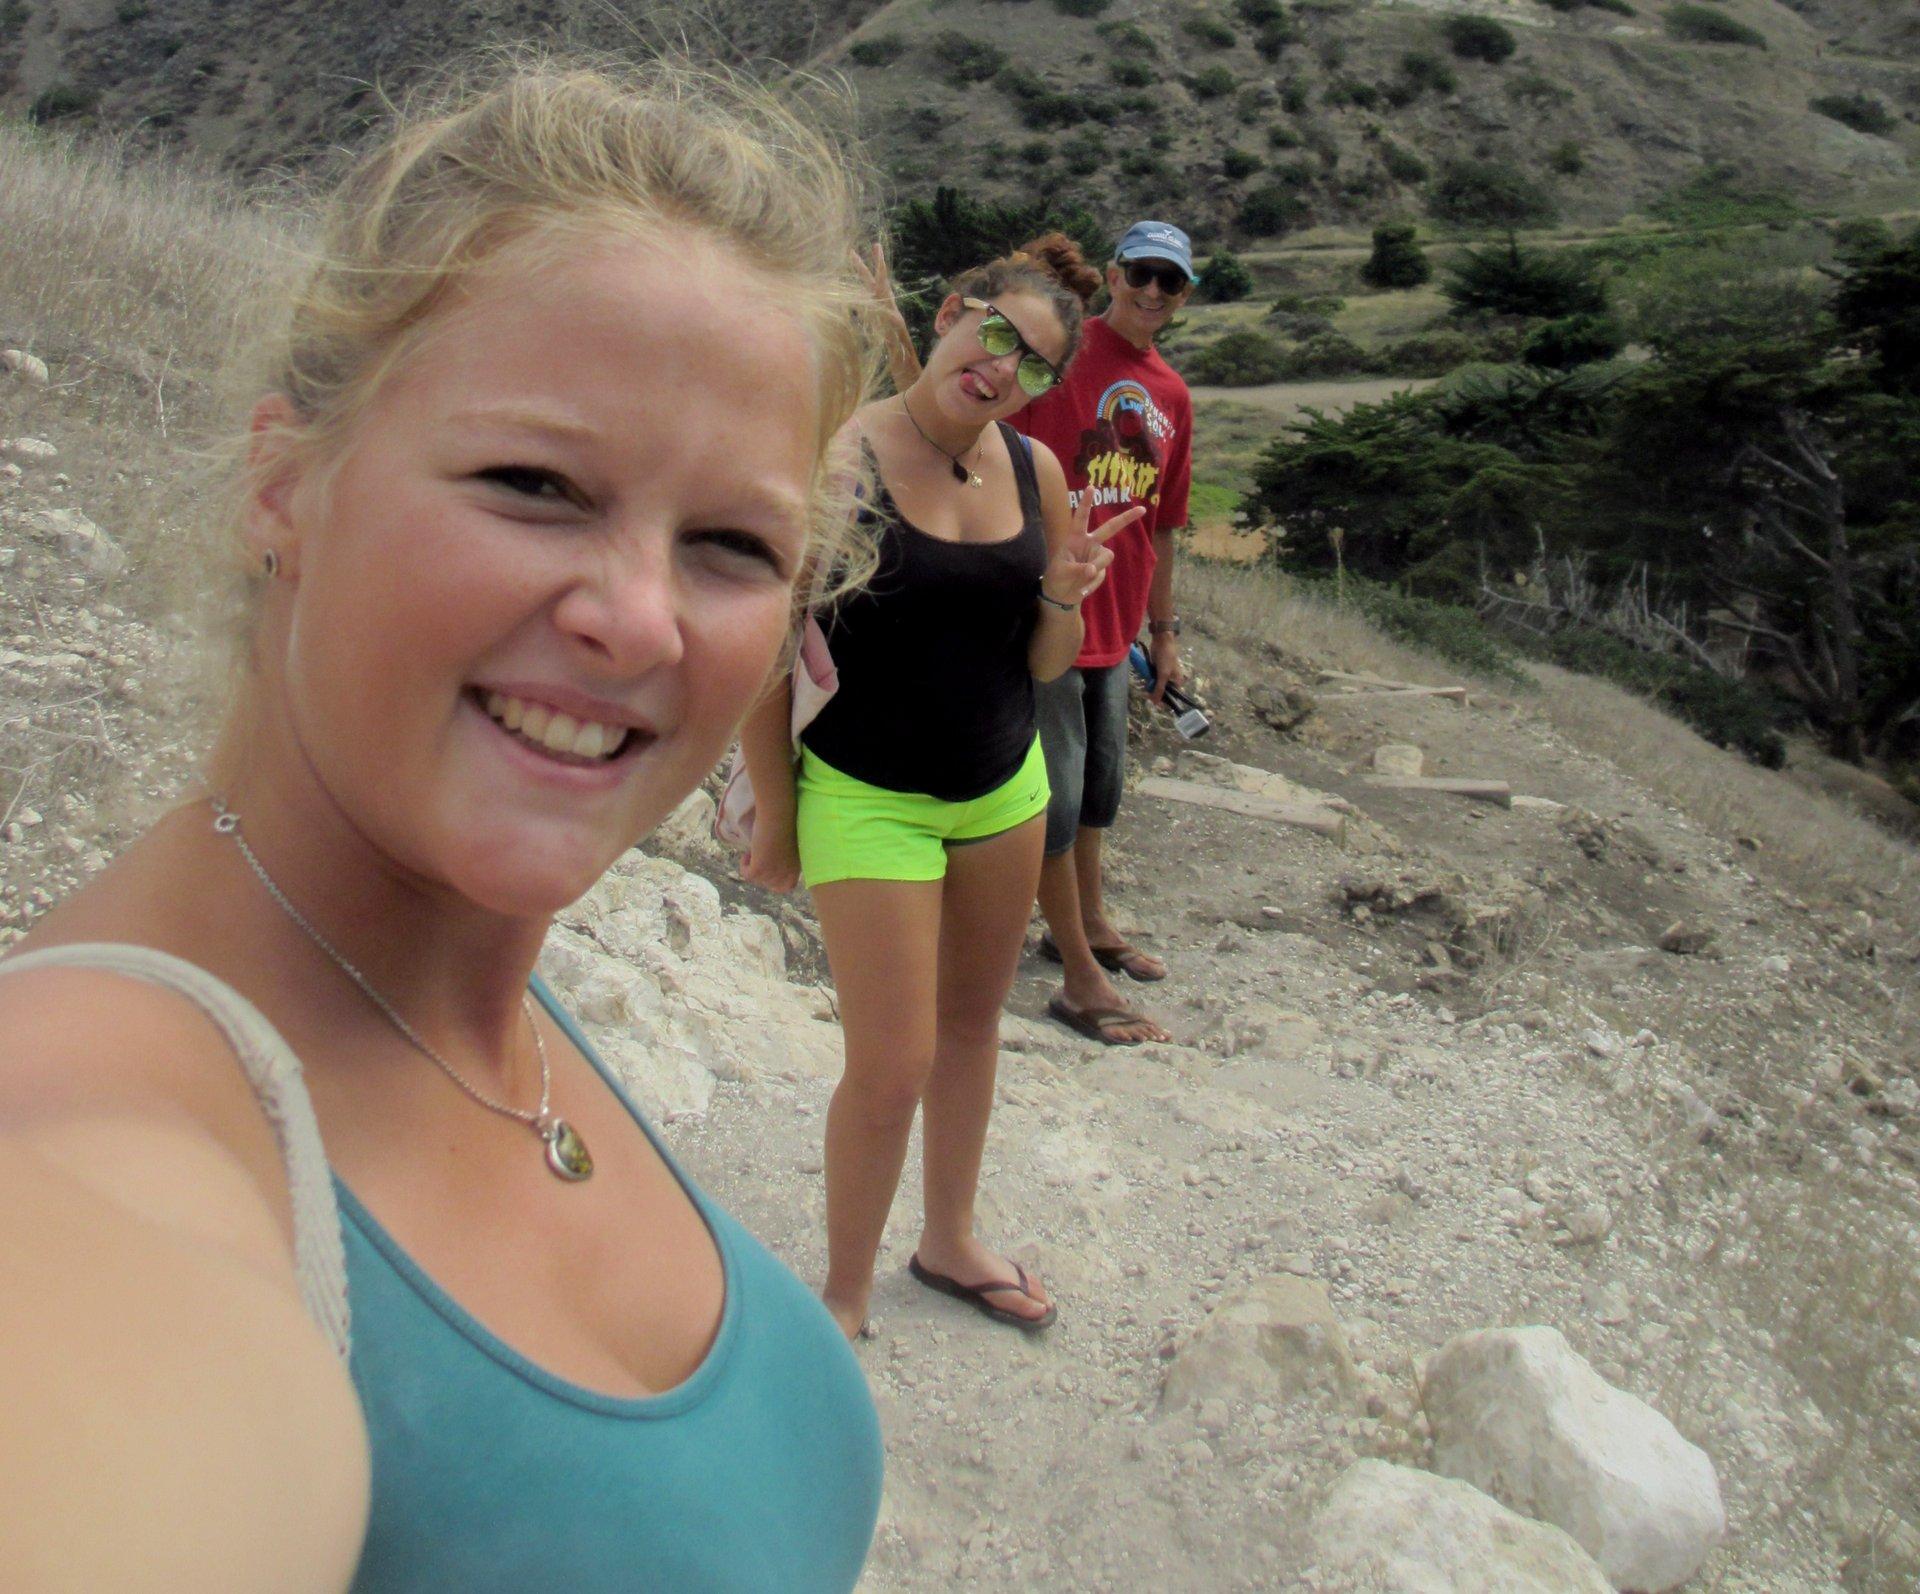 Stefanie Kuisle, Zeinab Greif, Glenn Zucman, hiking on Santa Cruz Island, Santa Barbara Channel, California Channel Islands